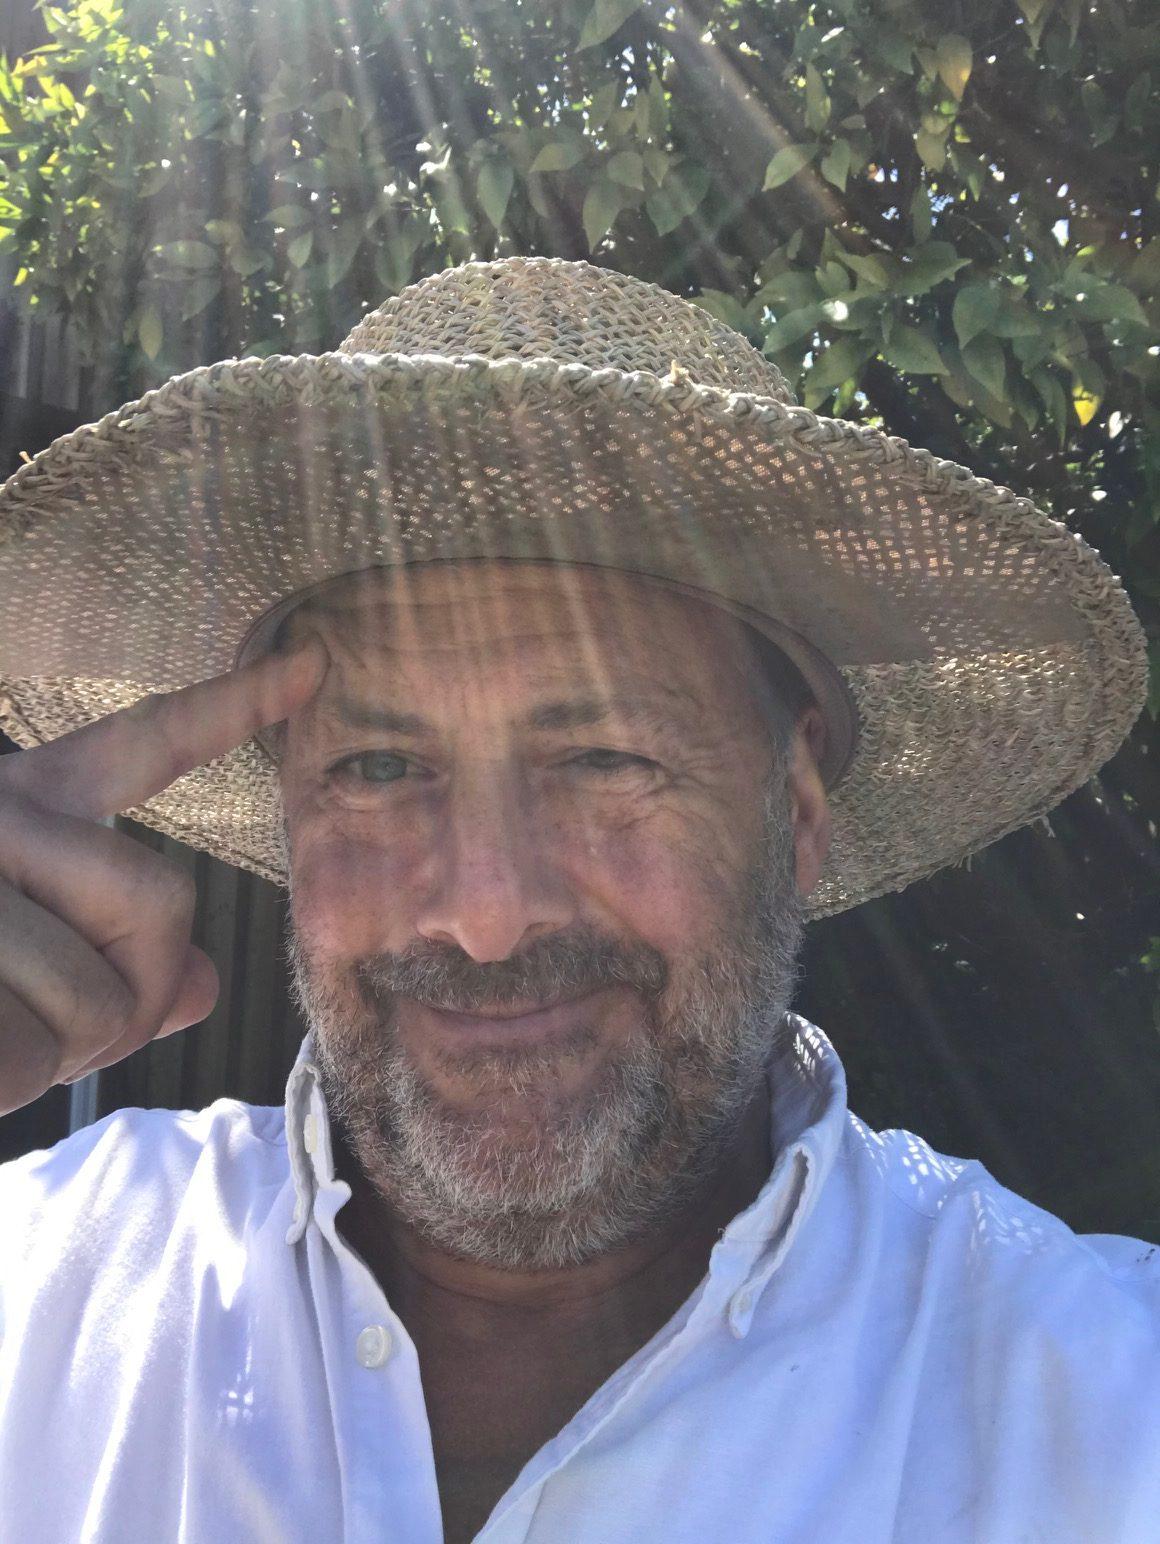 Sun-dappled picture of man in gardening sombrero.